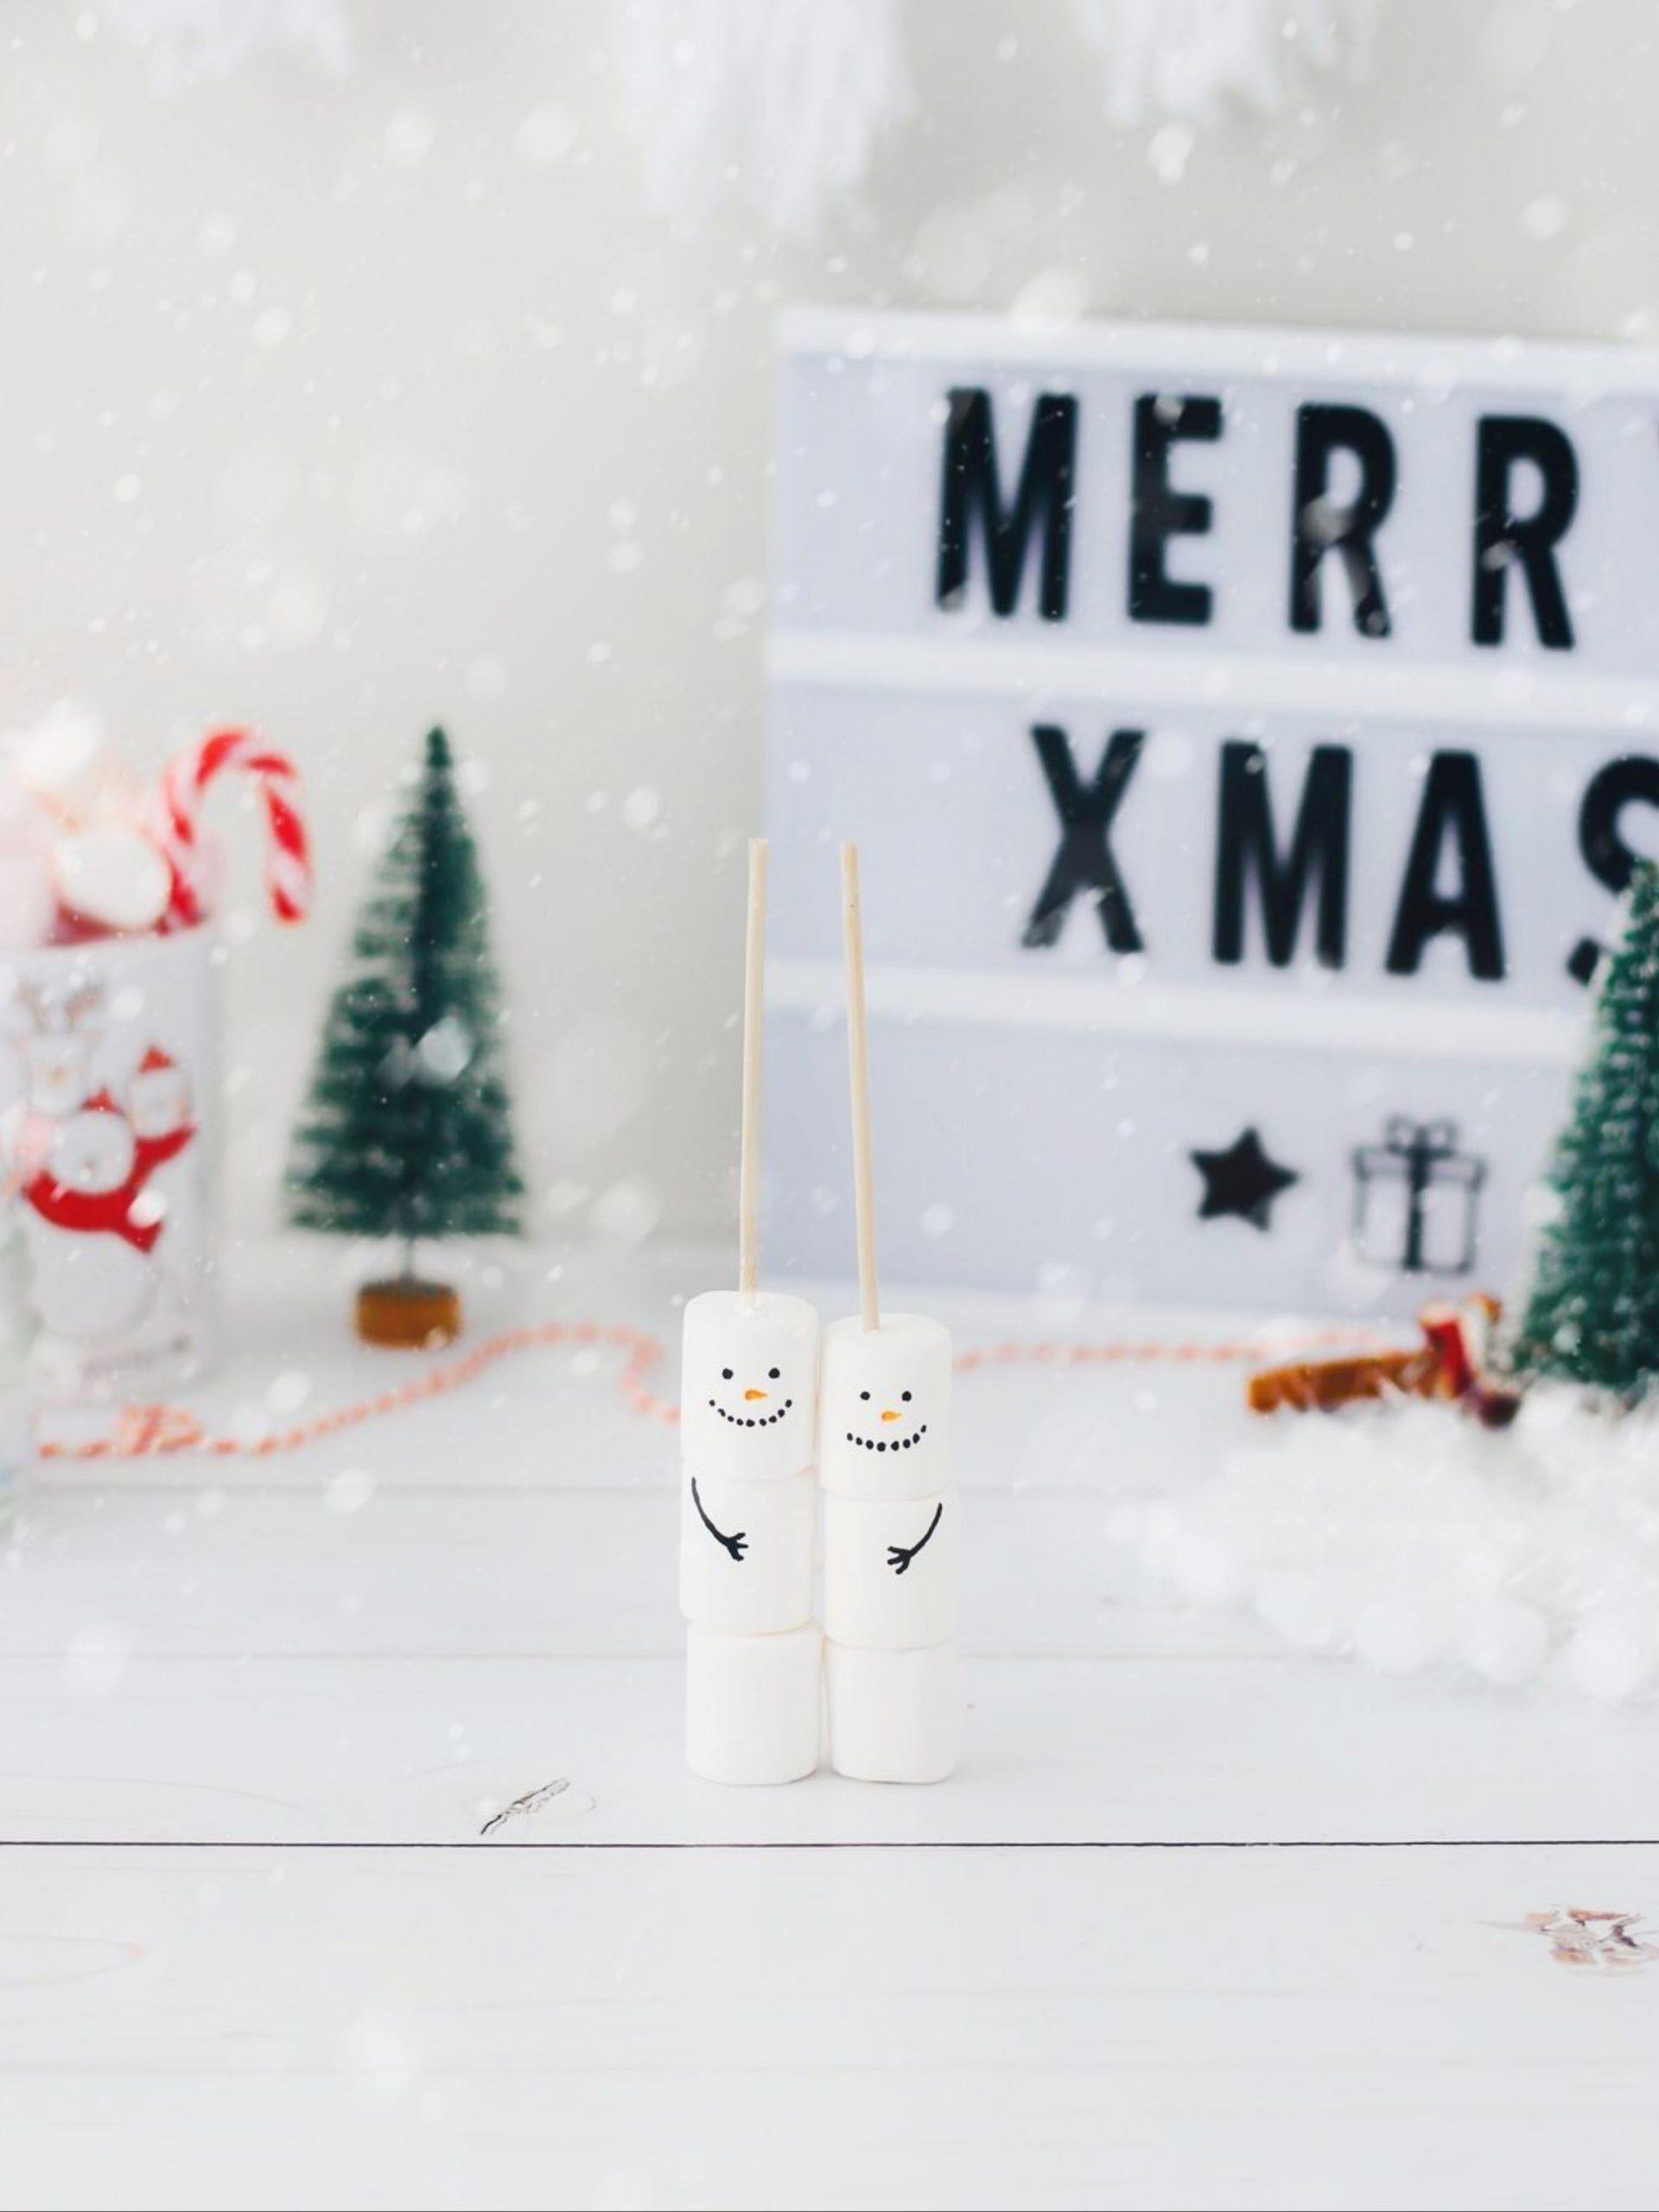 Christmas festival greetings